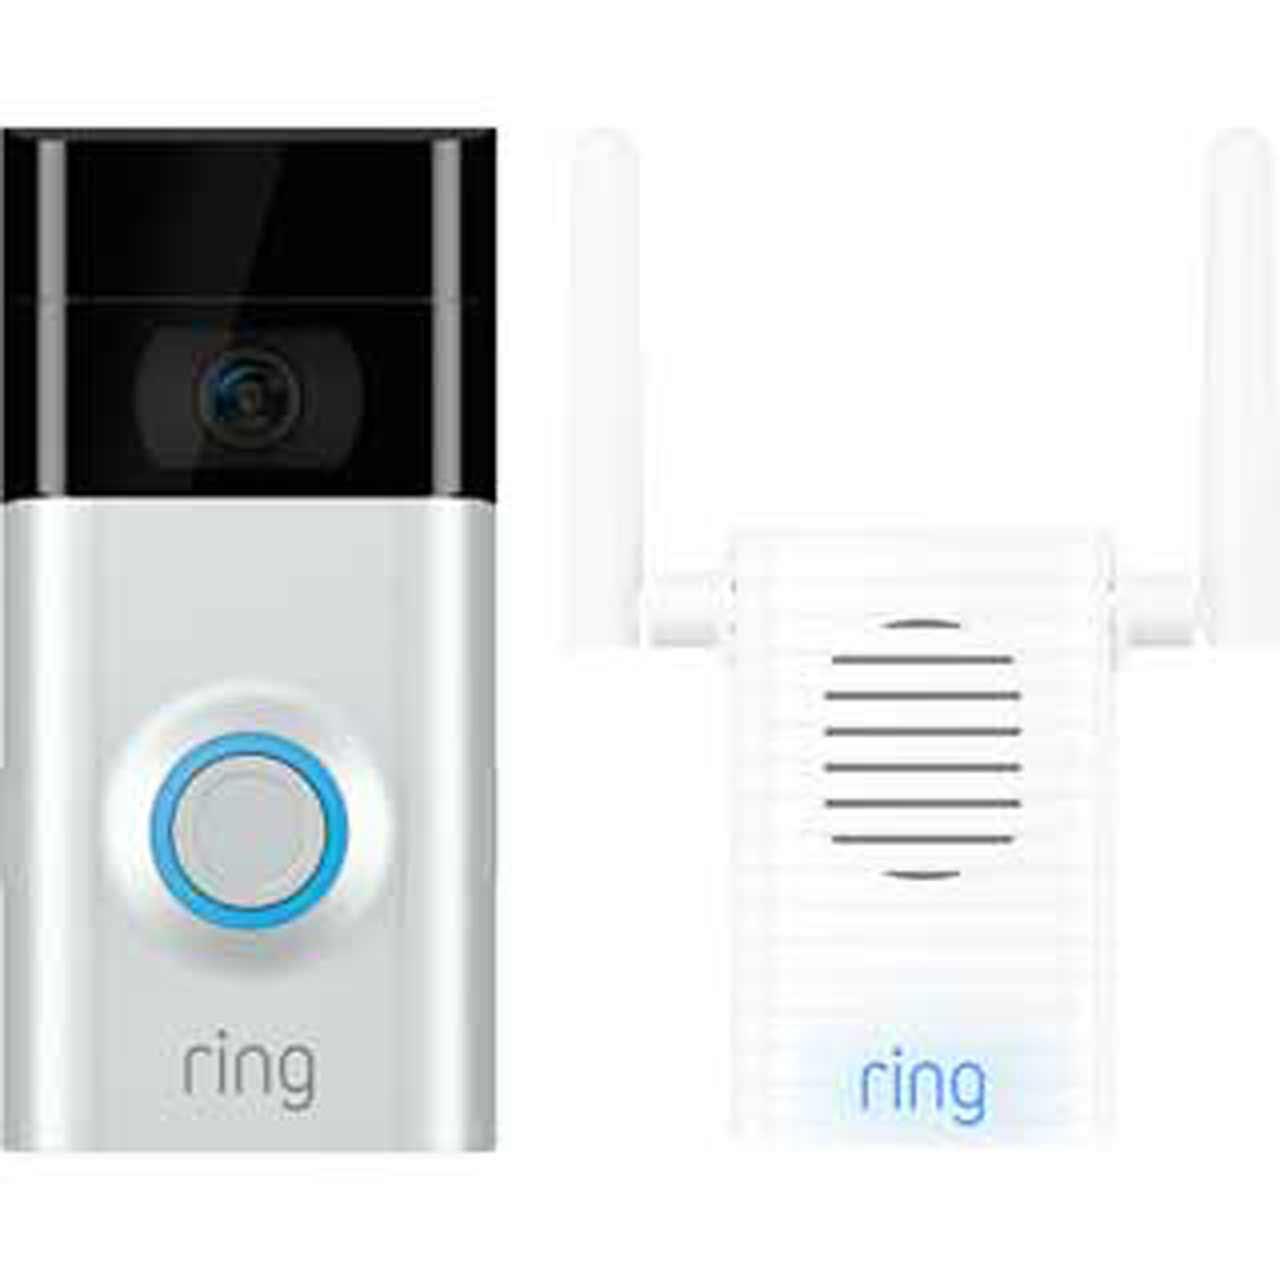 Ring Video Doorbell V2 & Chime Pro Bundle 169.00 @ AO.com